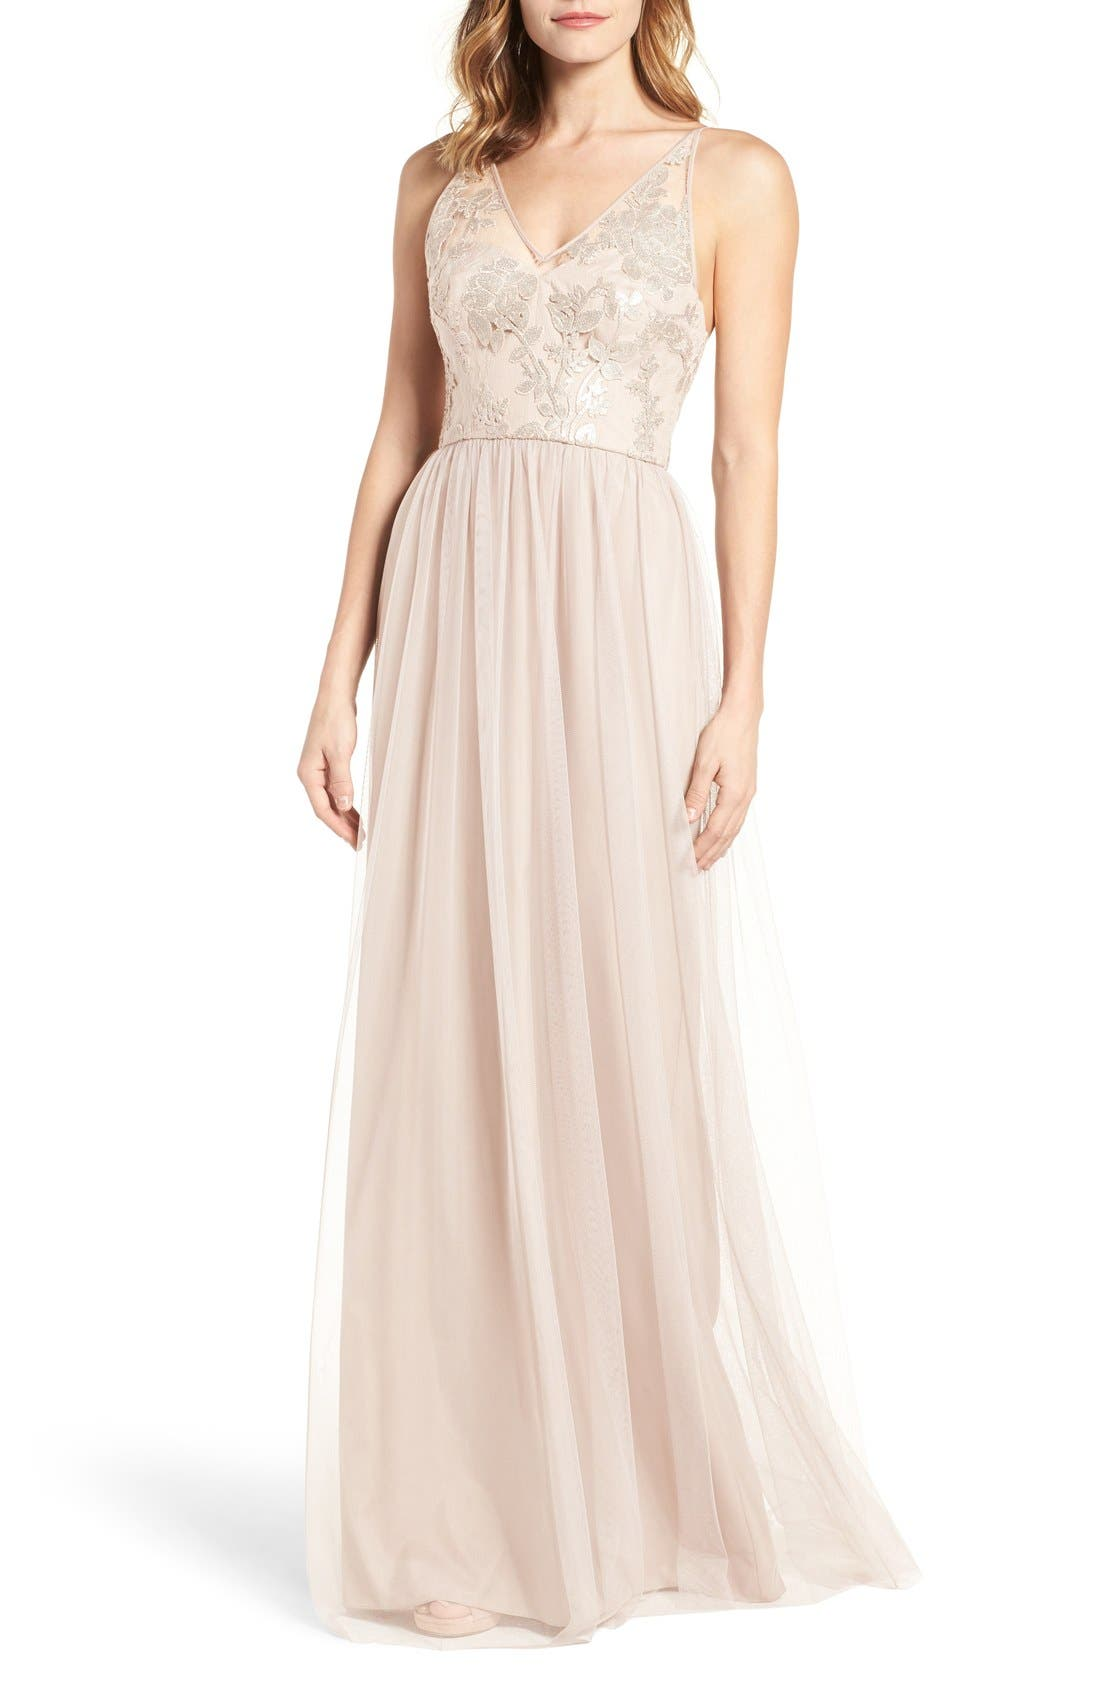 Sora Sequin & Lace Gown,                         Main,                         color, Fawn